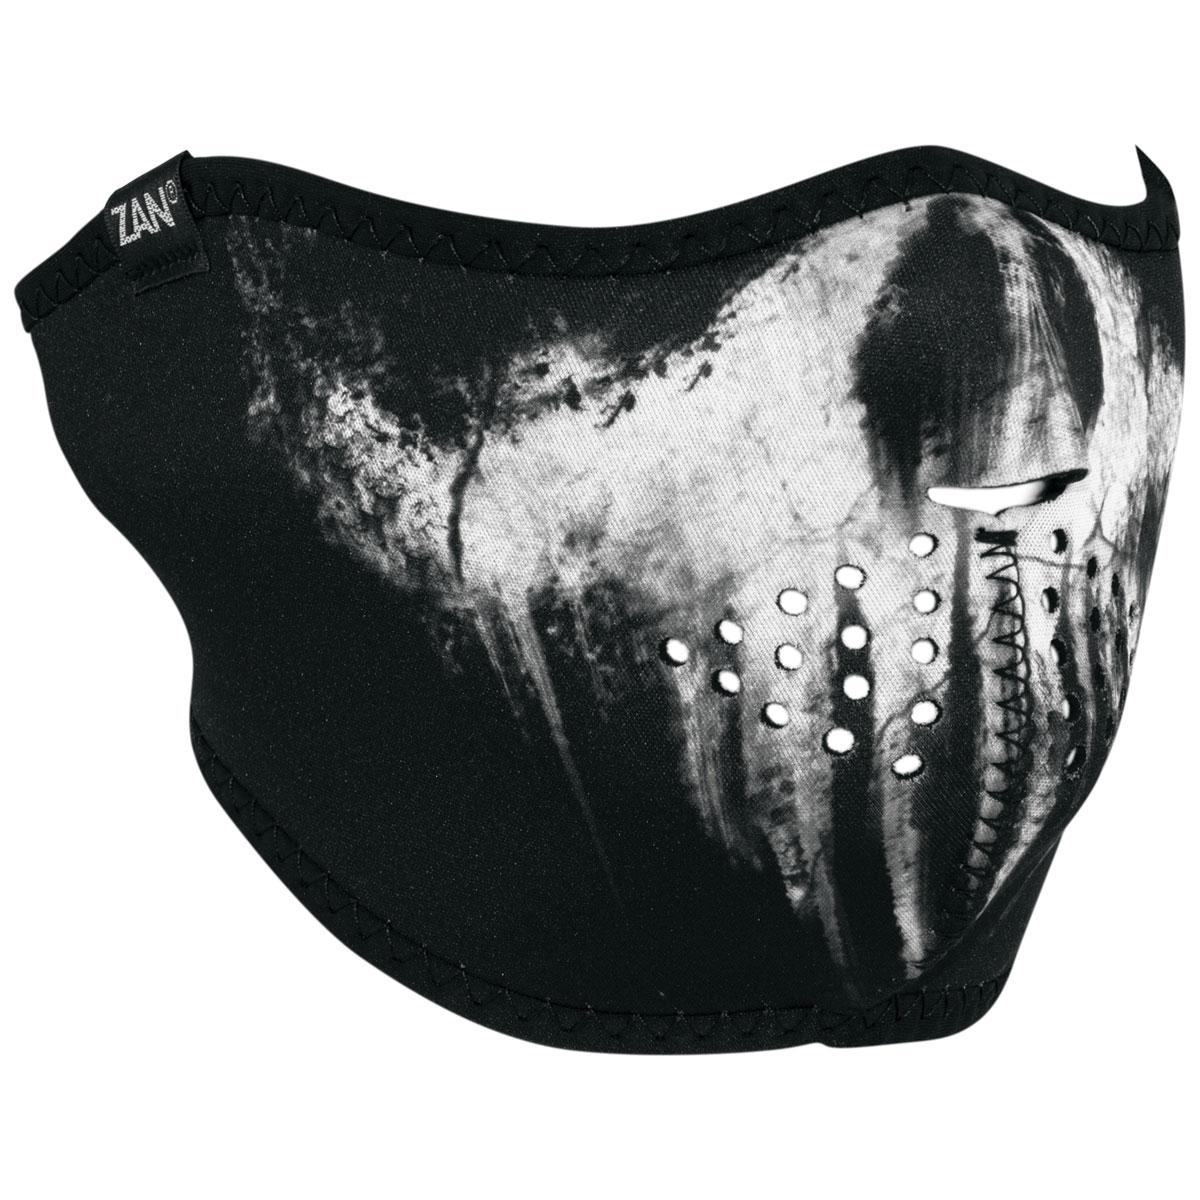 ZAN headgear Neoprene Skull Ghost Half Face Mask